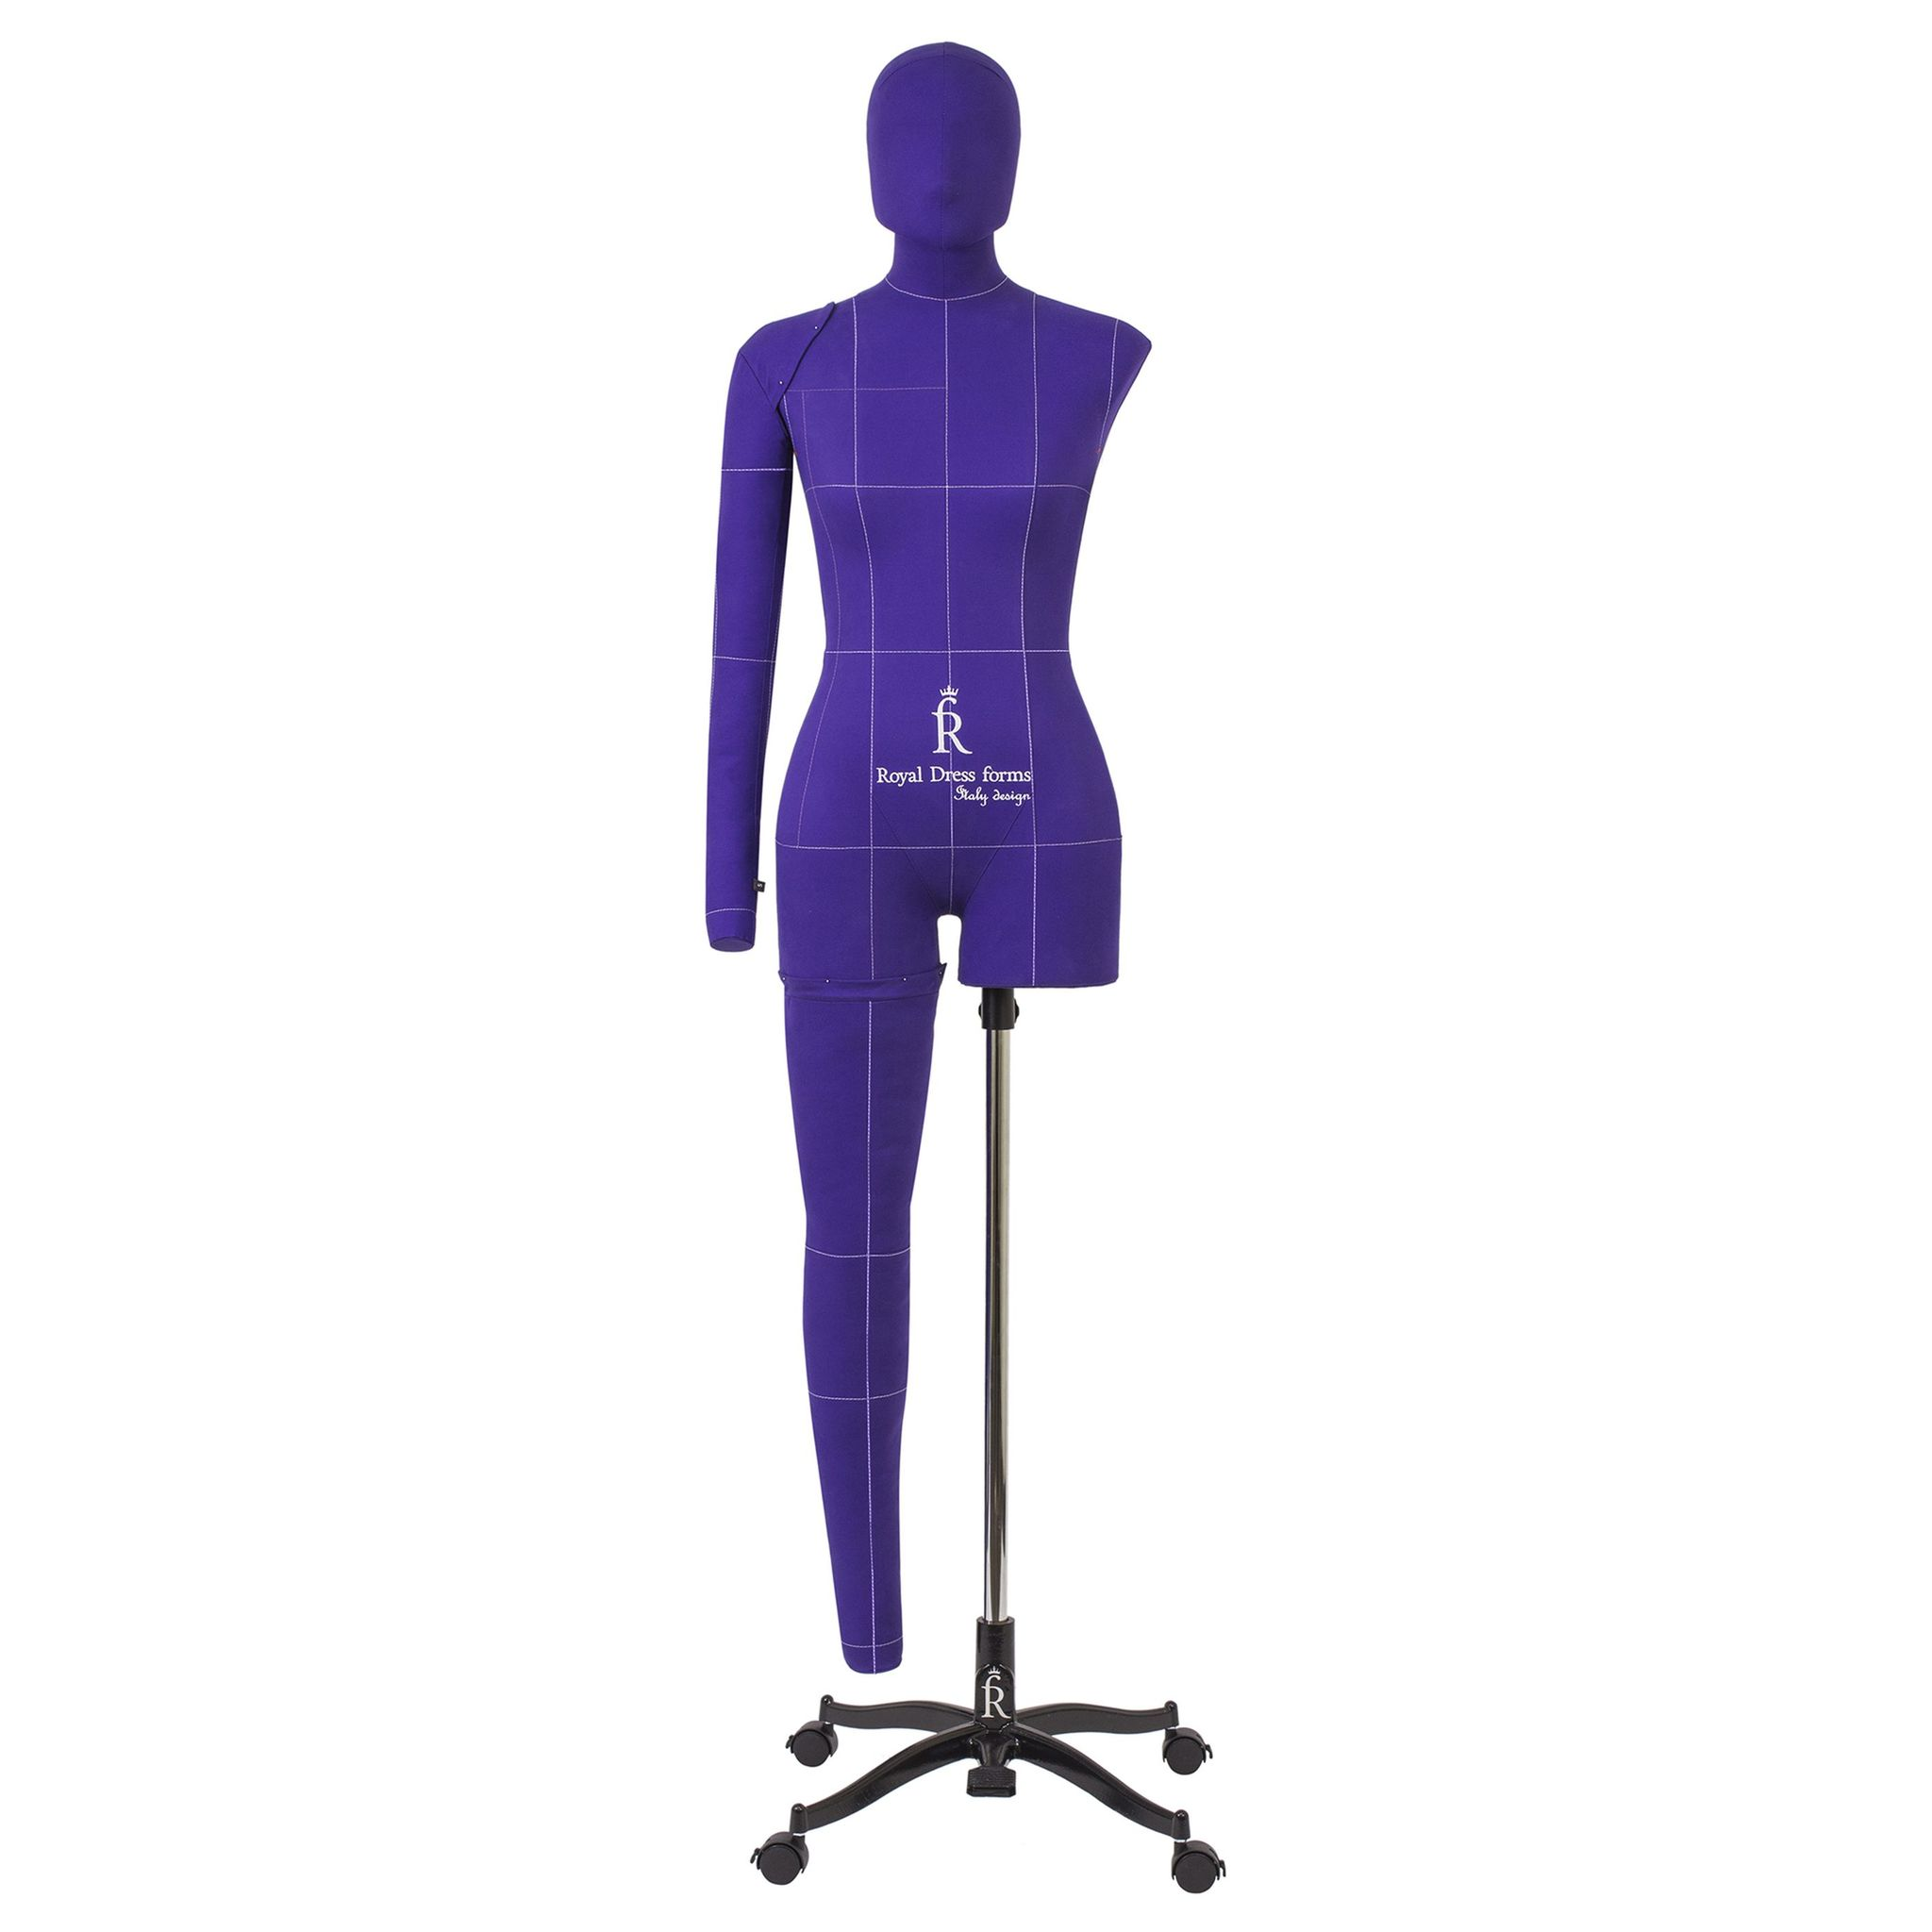 Манекен портновский Моника, комплект Арт, размер 42, ФиолетовыйФото 1